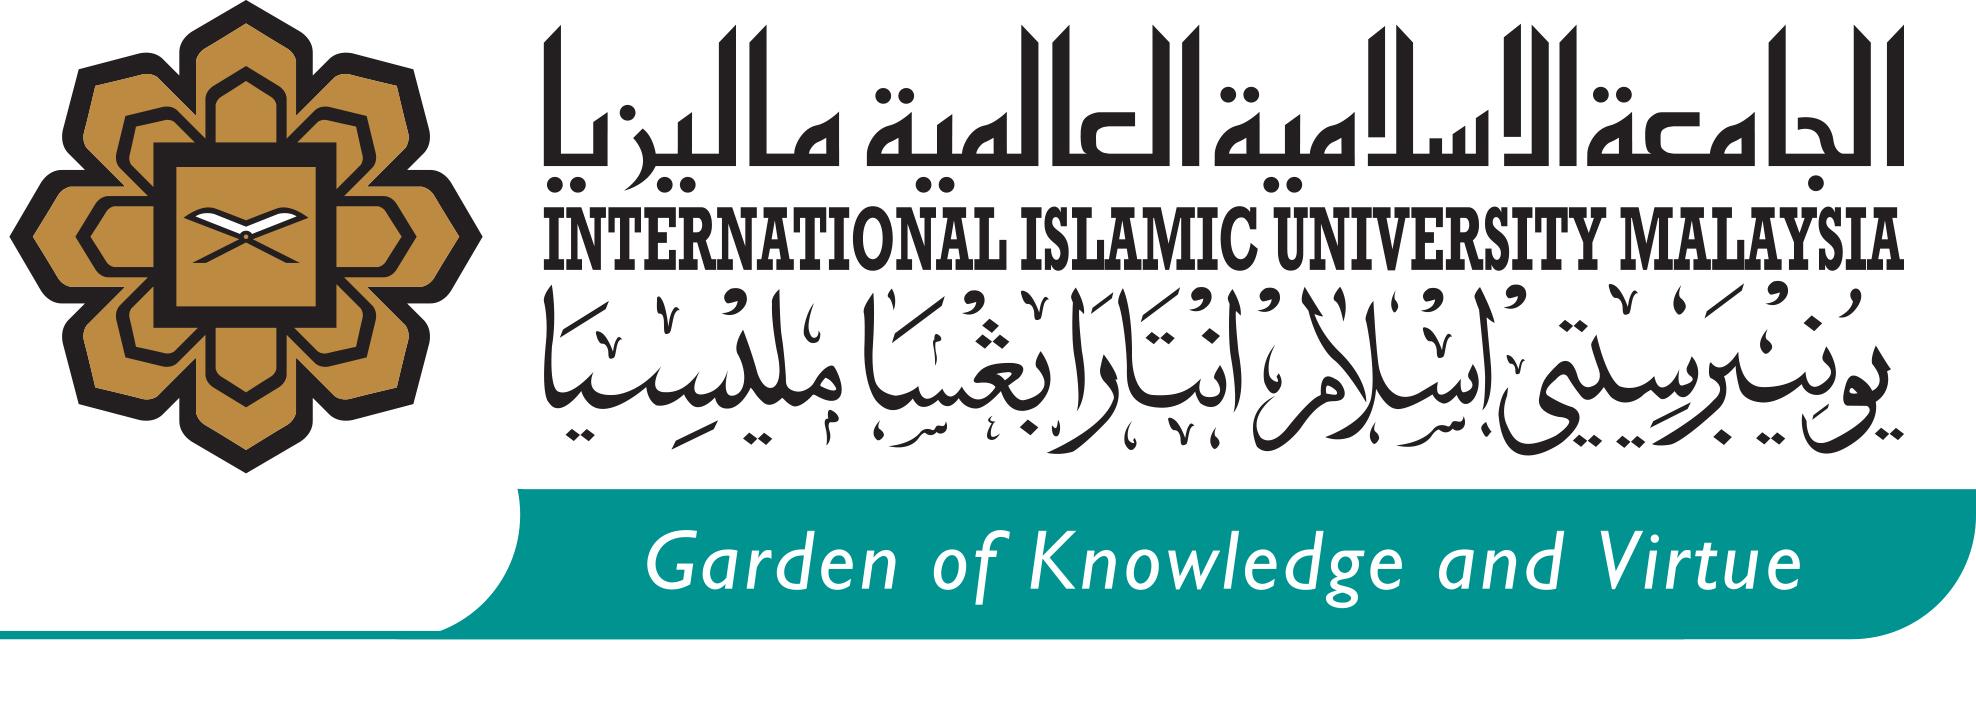 INTERNATIONAL STUDENT ADMISSION UNIT